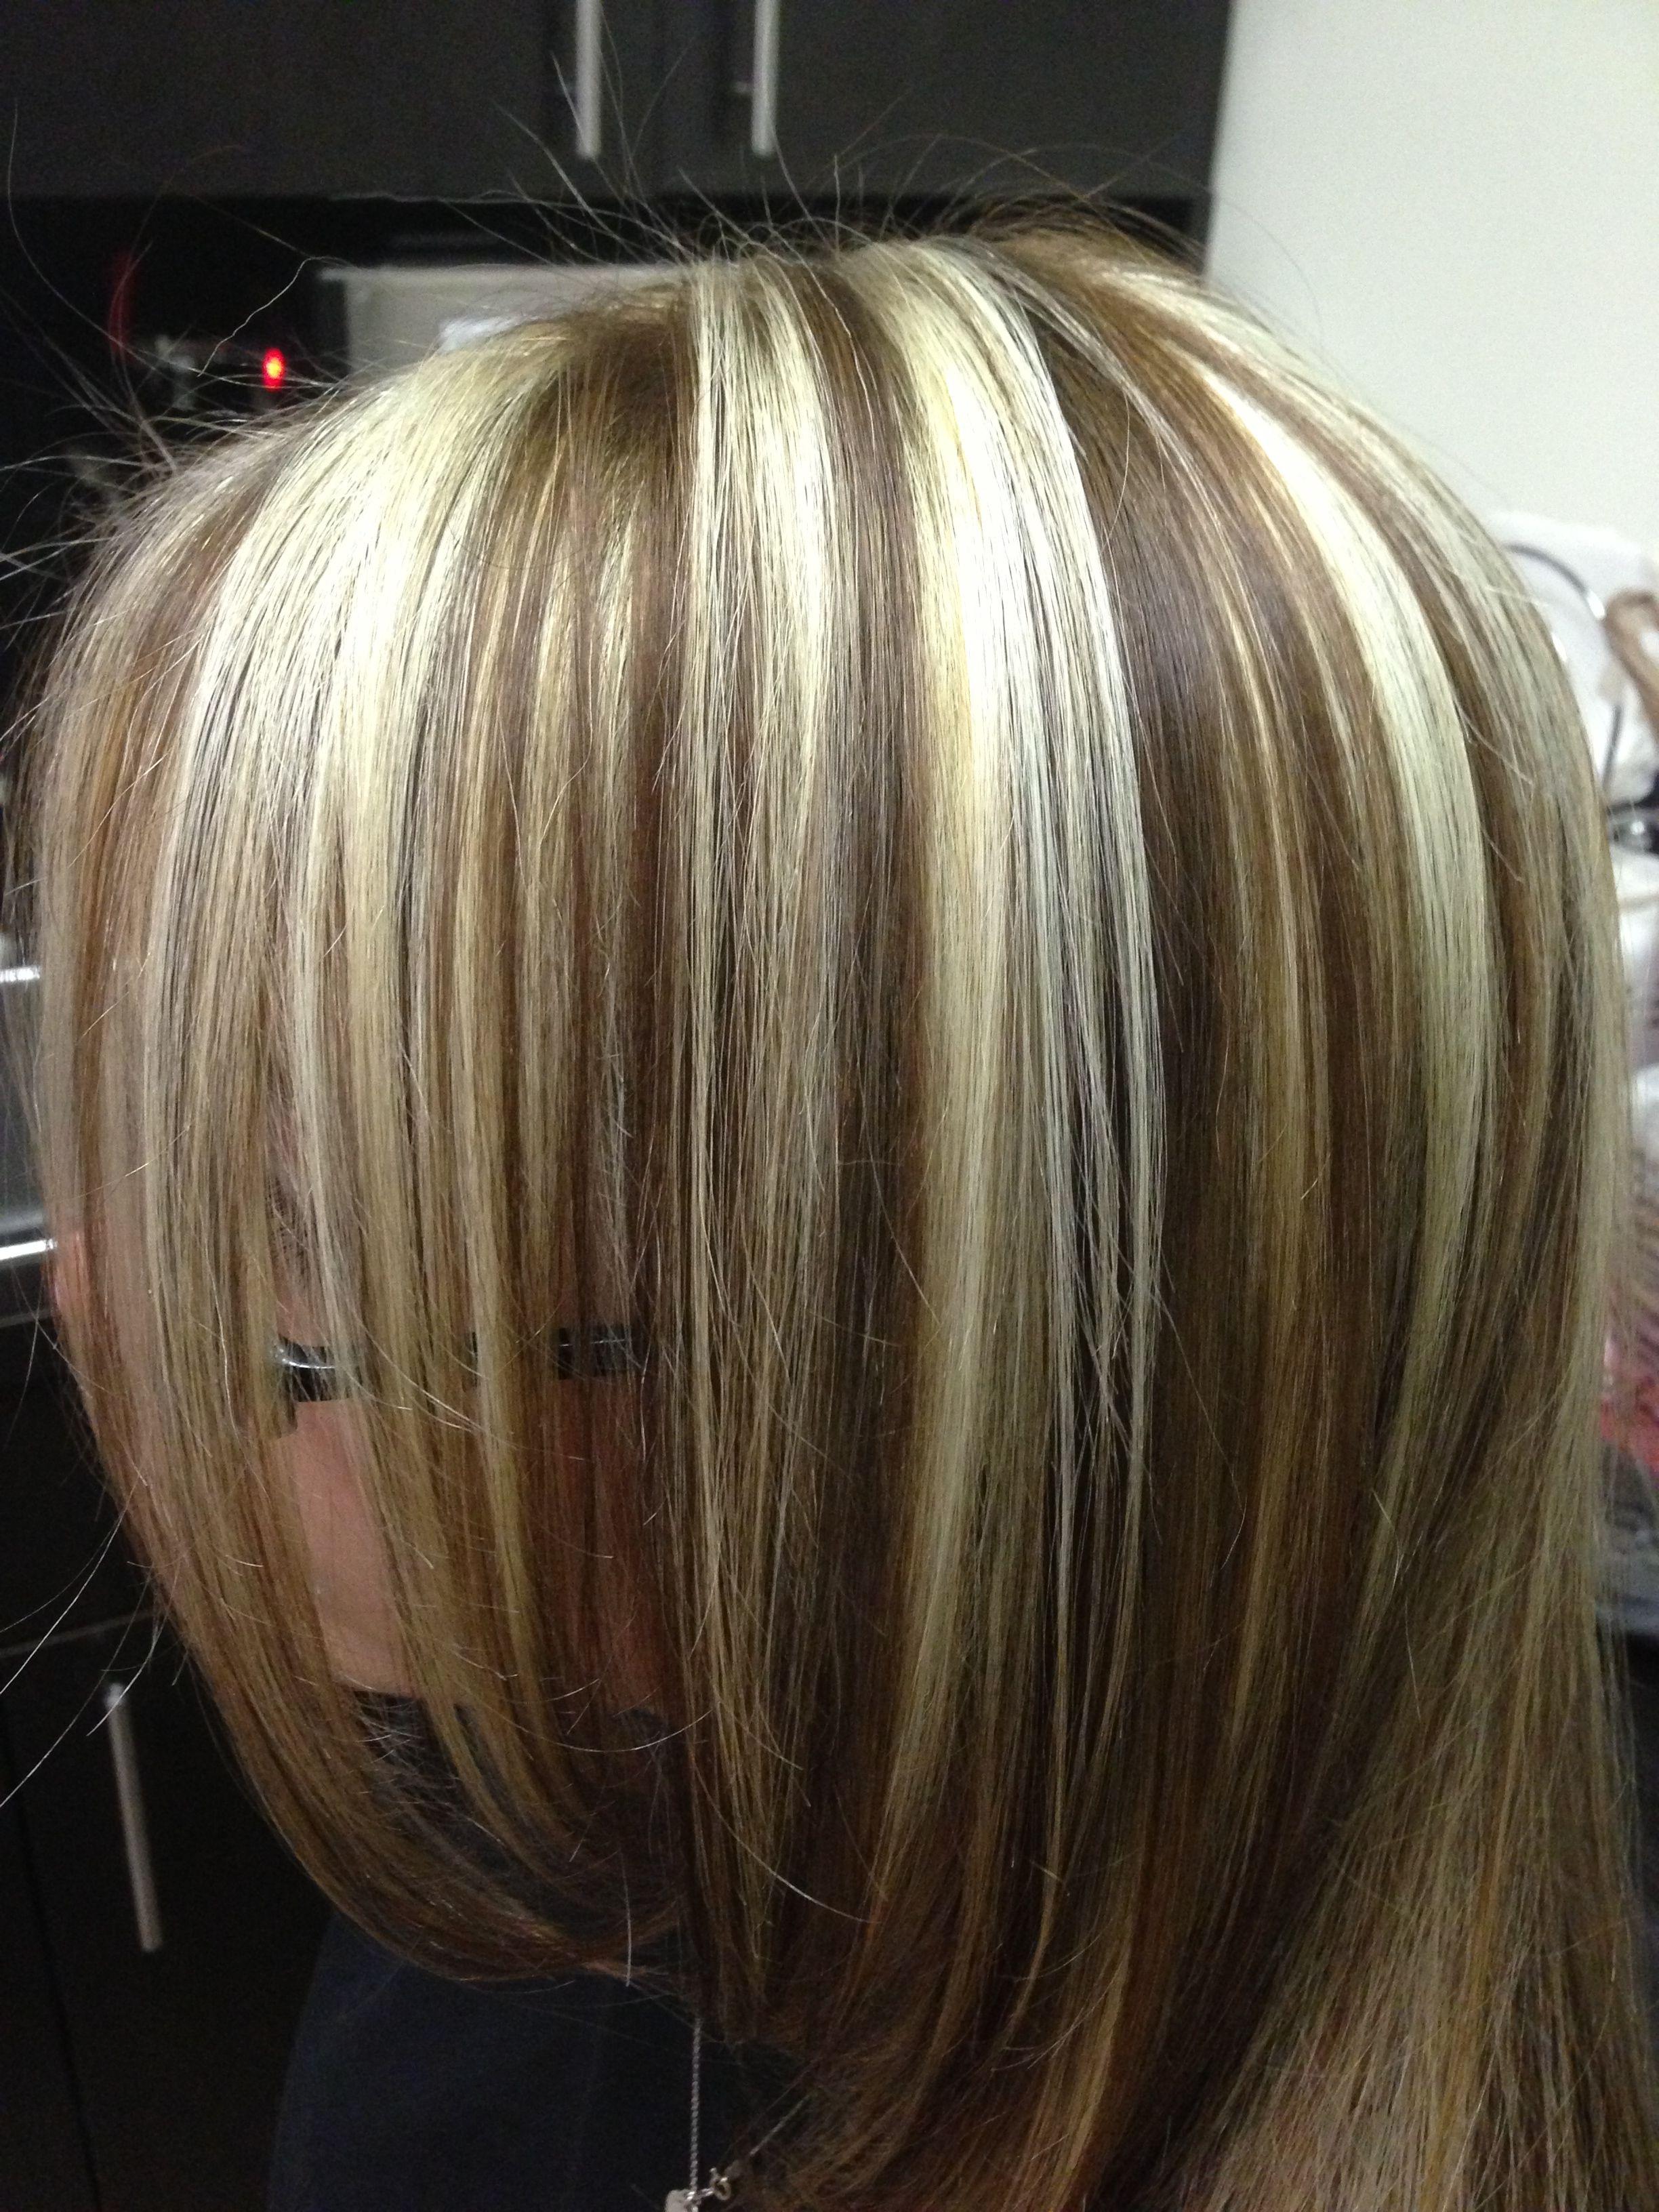 Blonde Highlights And Golden Brown Lowlights Derrica